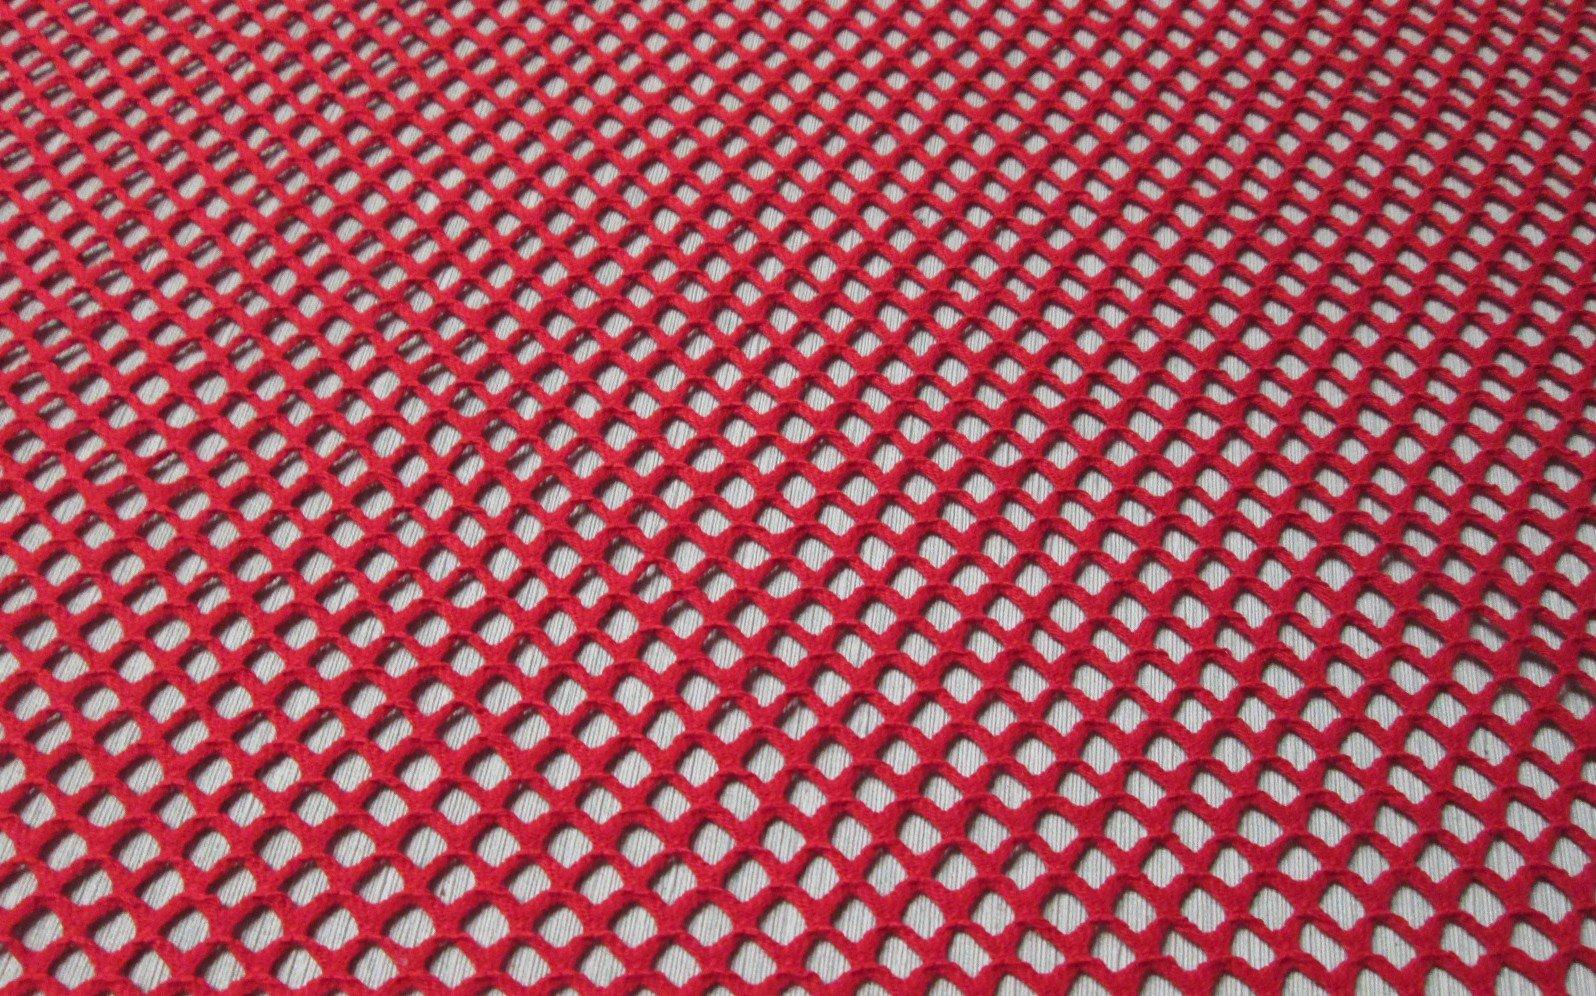 Cotton crochet net fabric in 7 colors bird city fabrics for Fabrics and materials